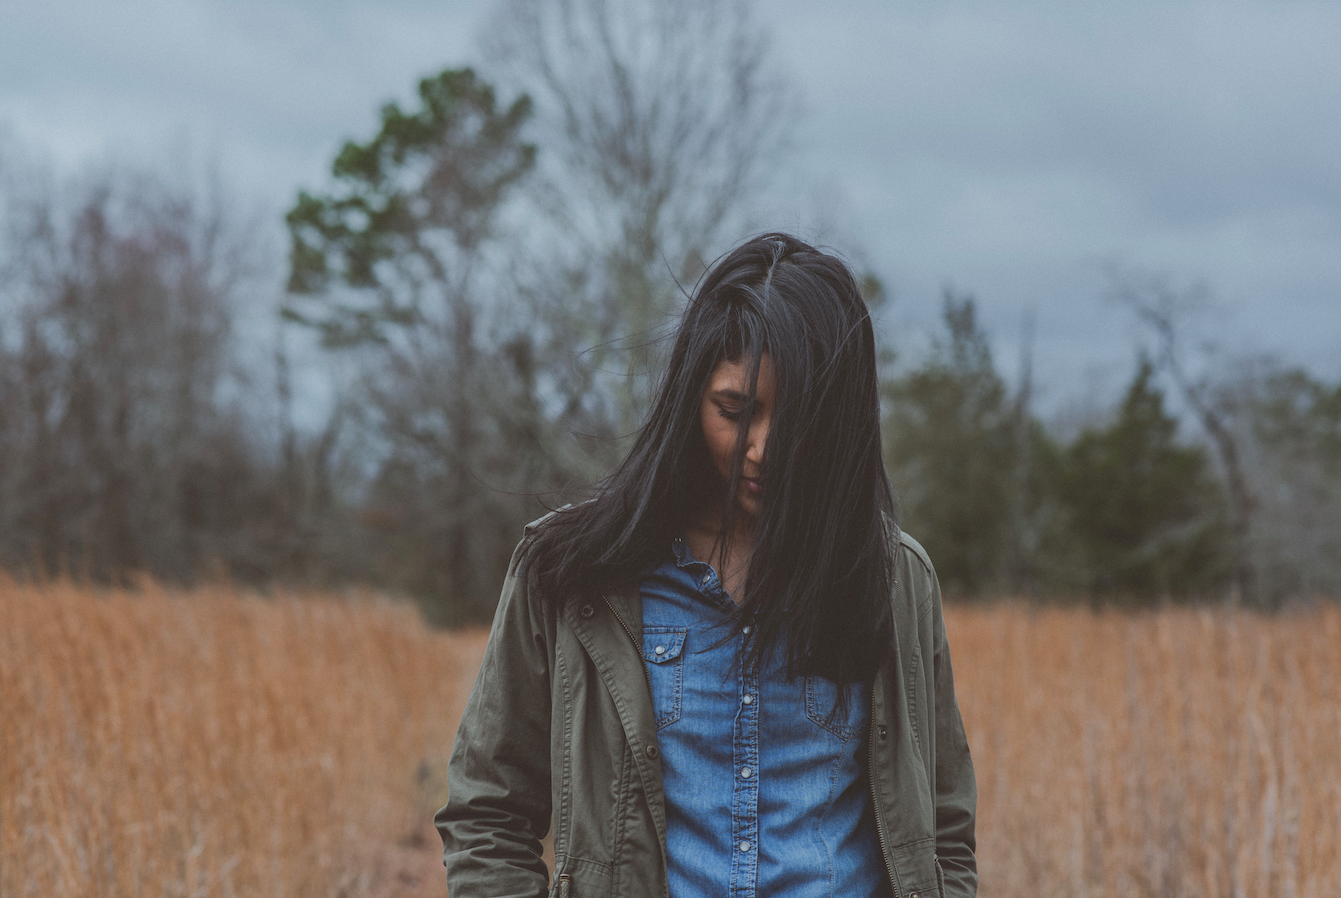 sad-woman-walking-through-field